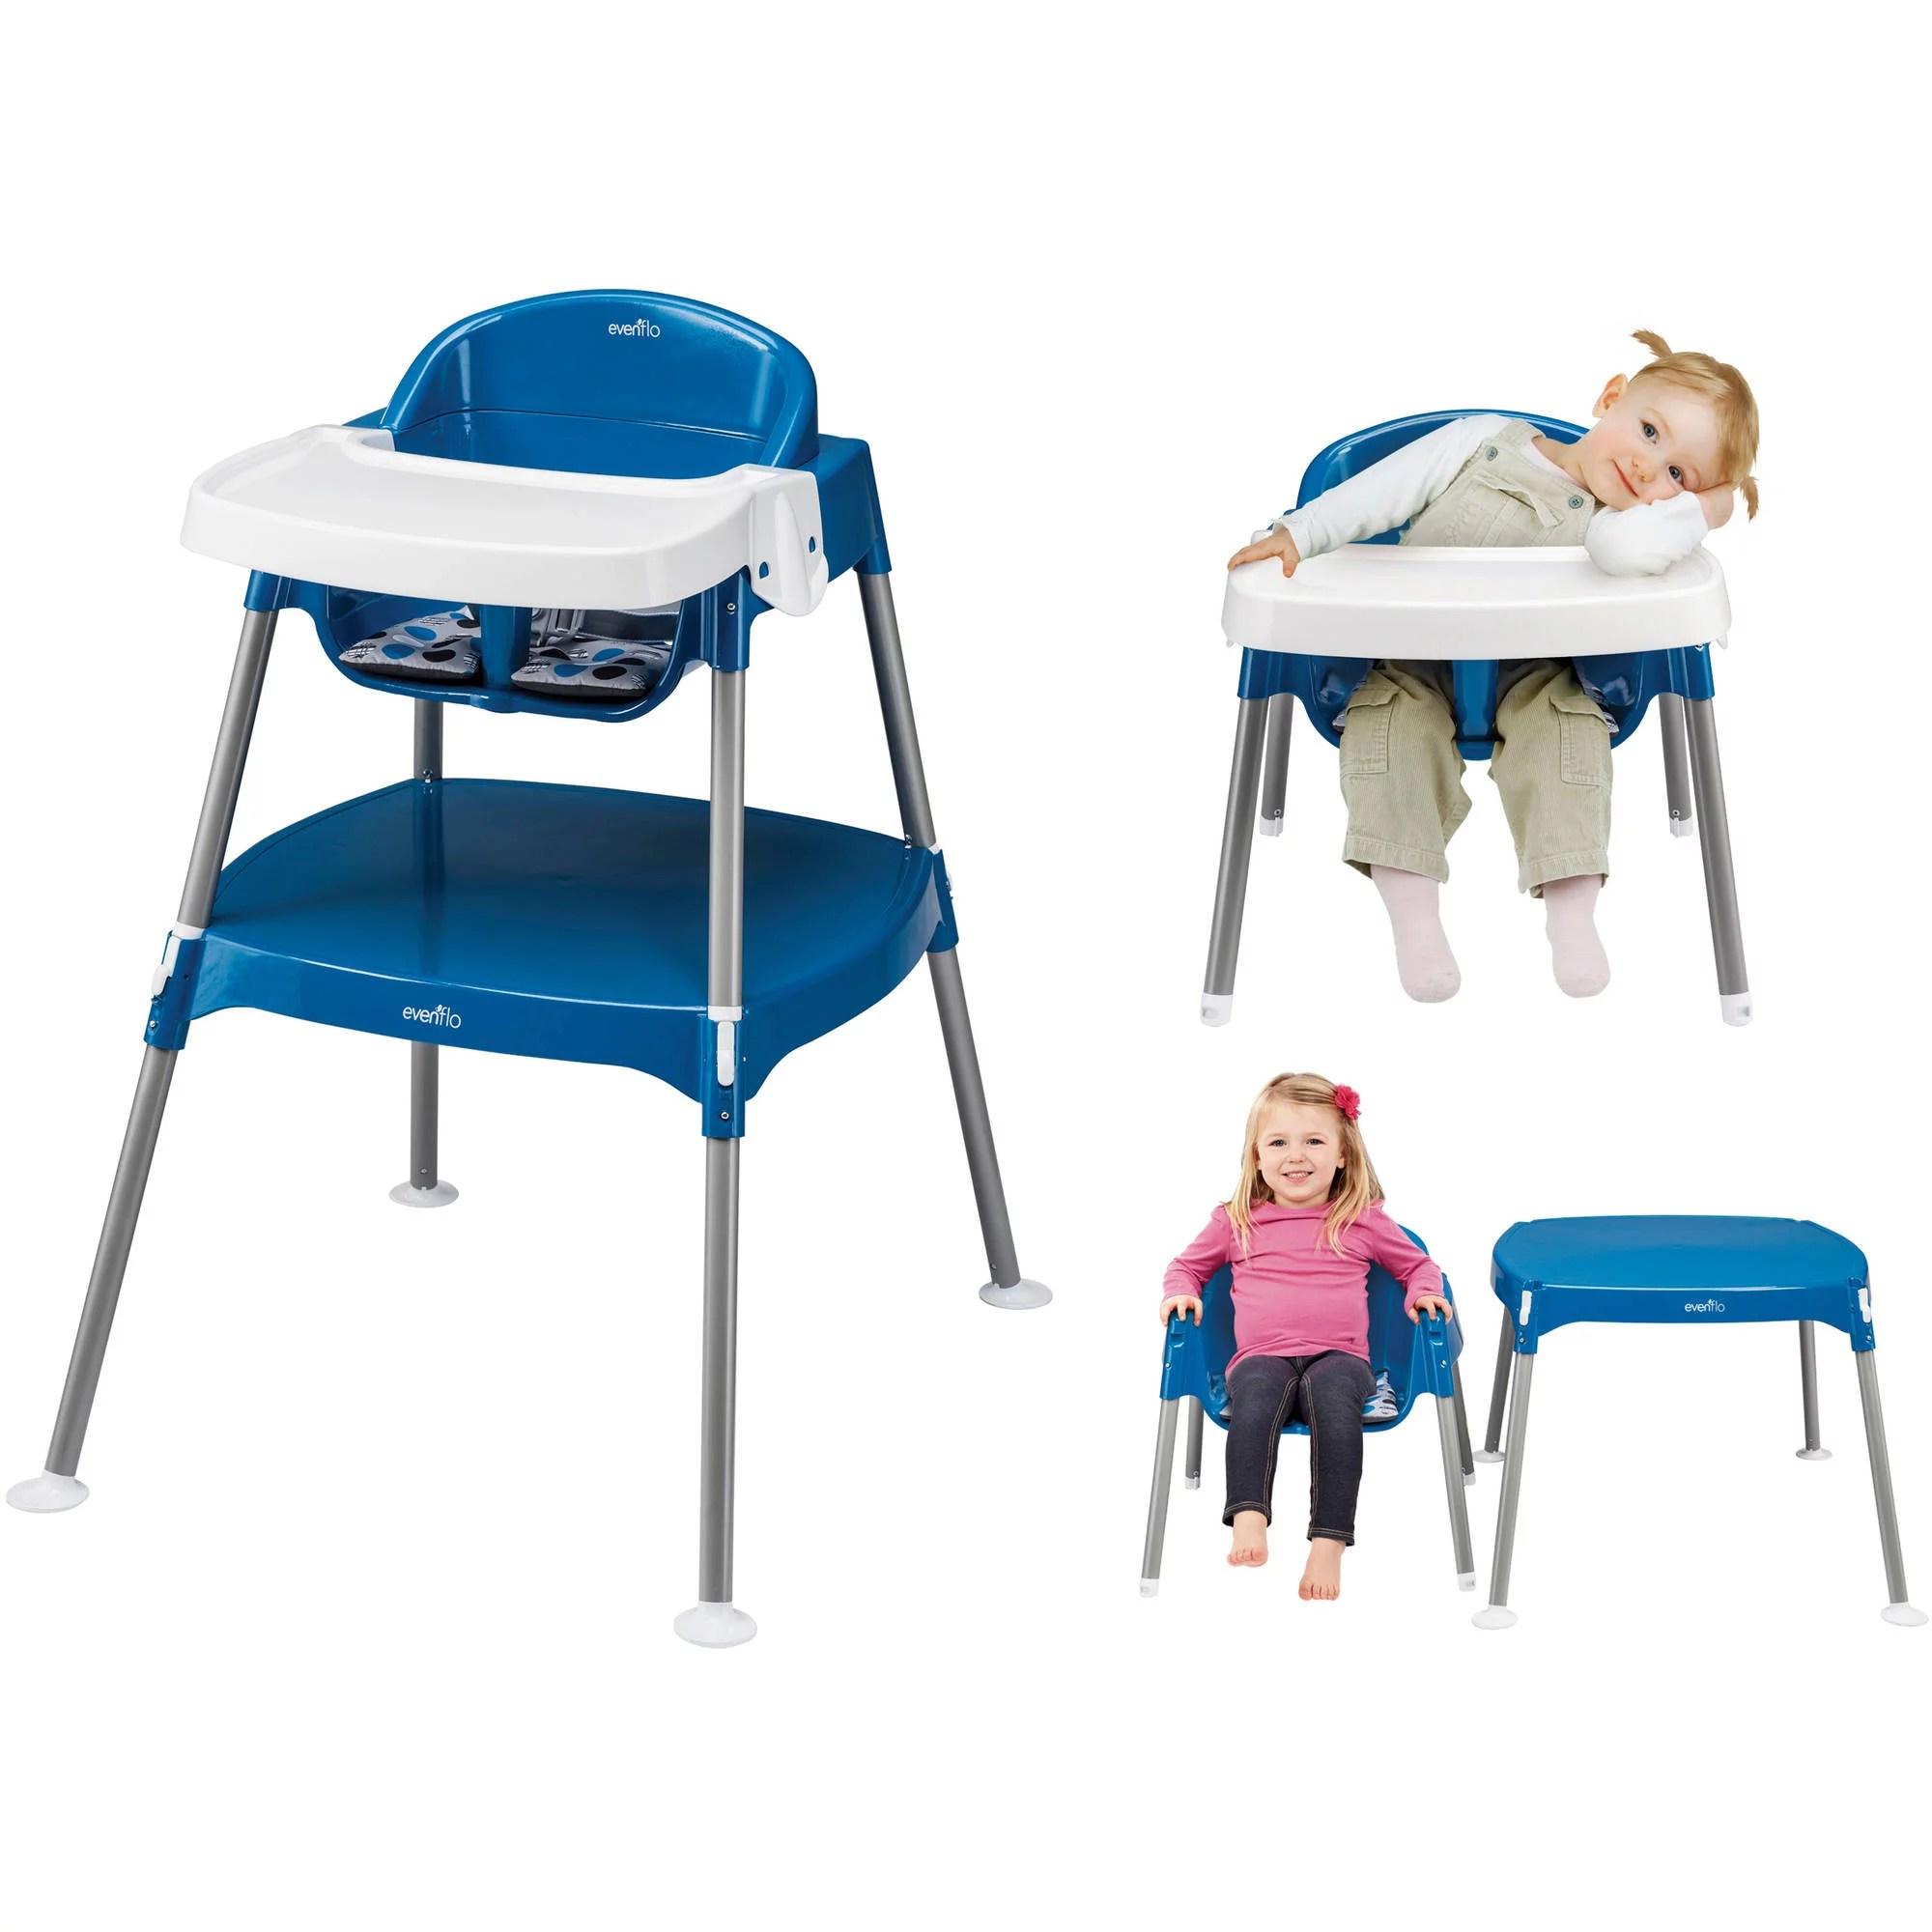 evenflo easy fold high chair cover decorations for wedding minimeal dottie royal walmart com